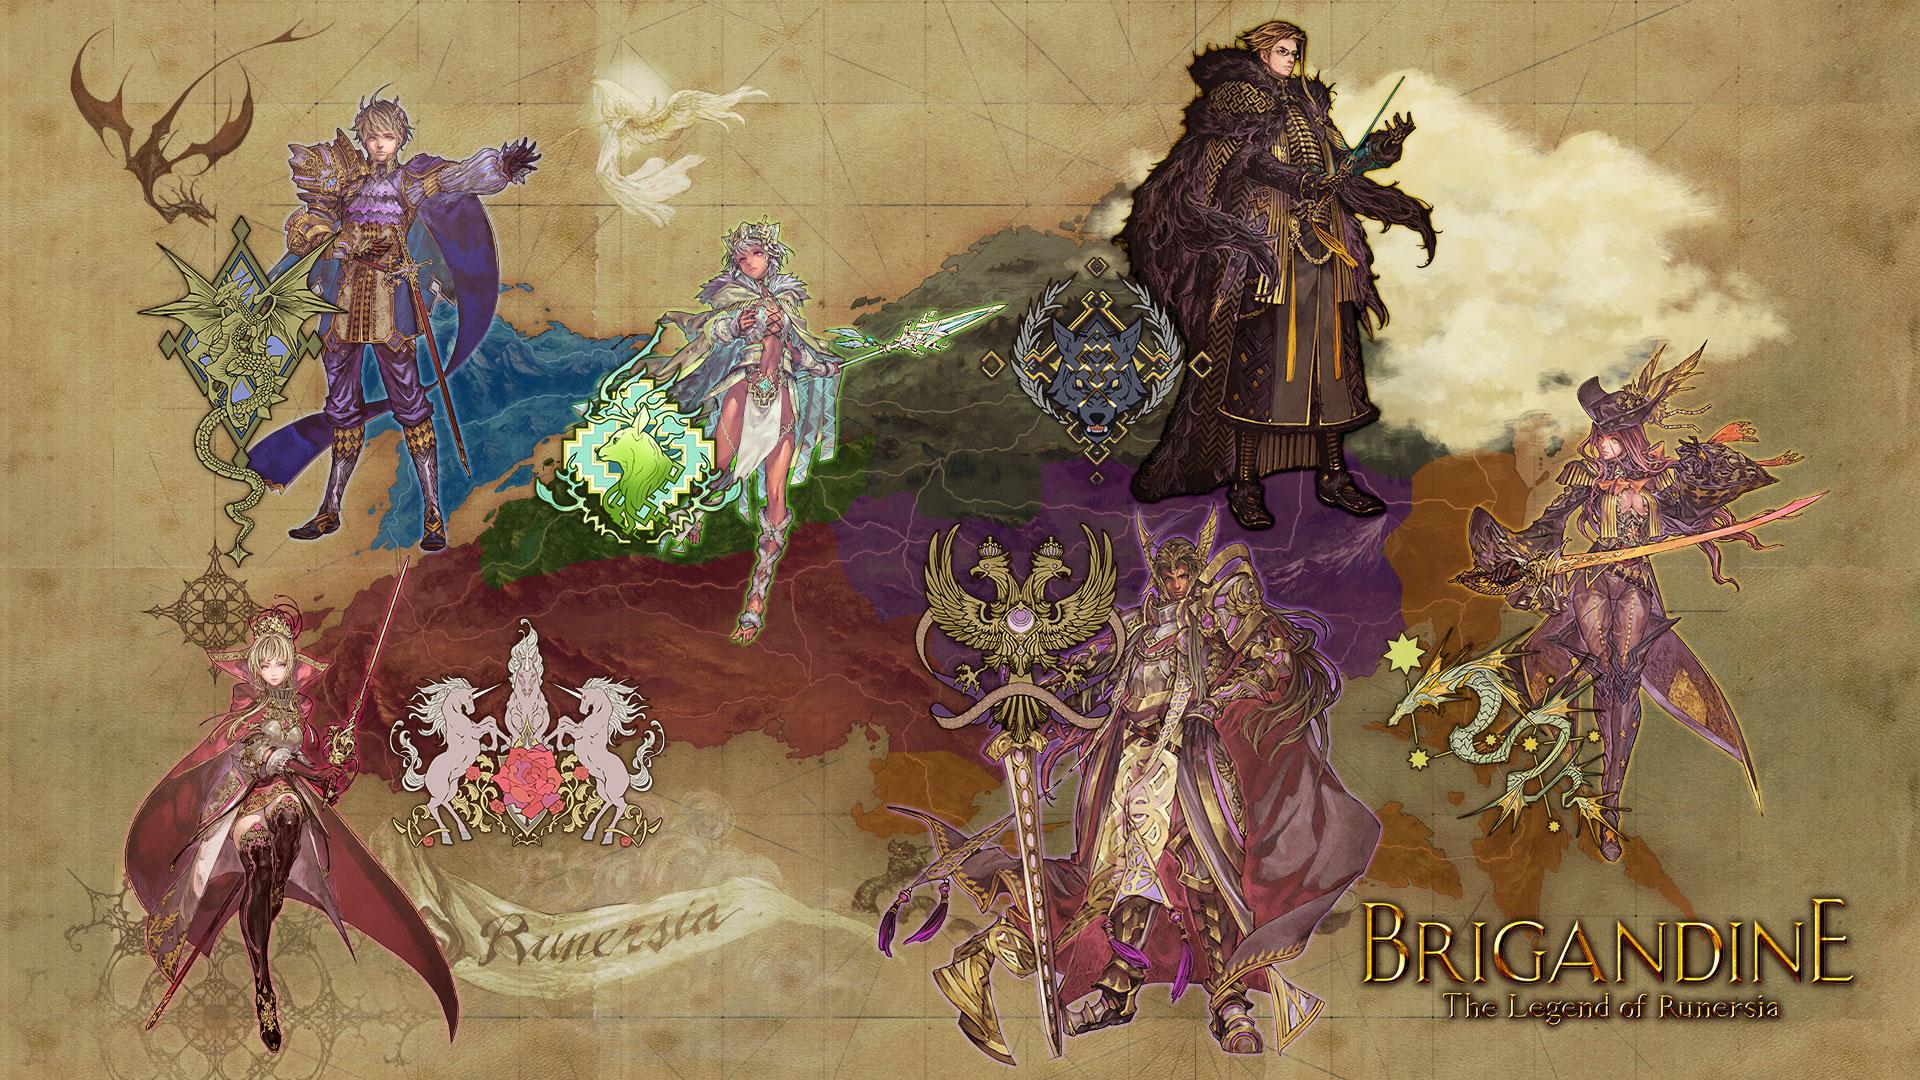 Brigandine-The-Legend-of-Runersia_2020_02-26-20_019